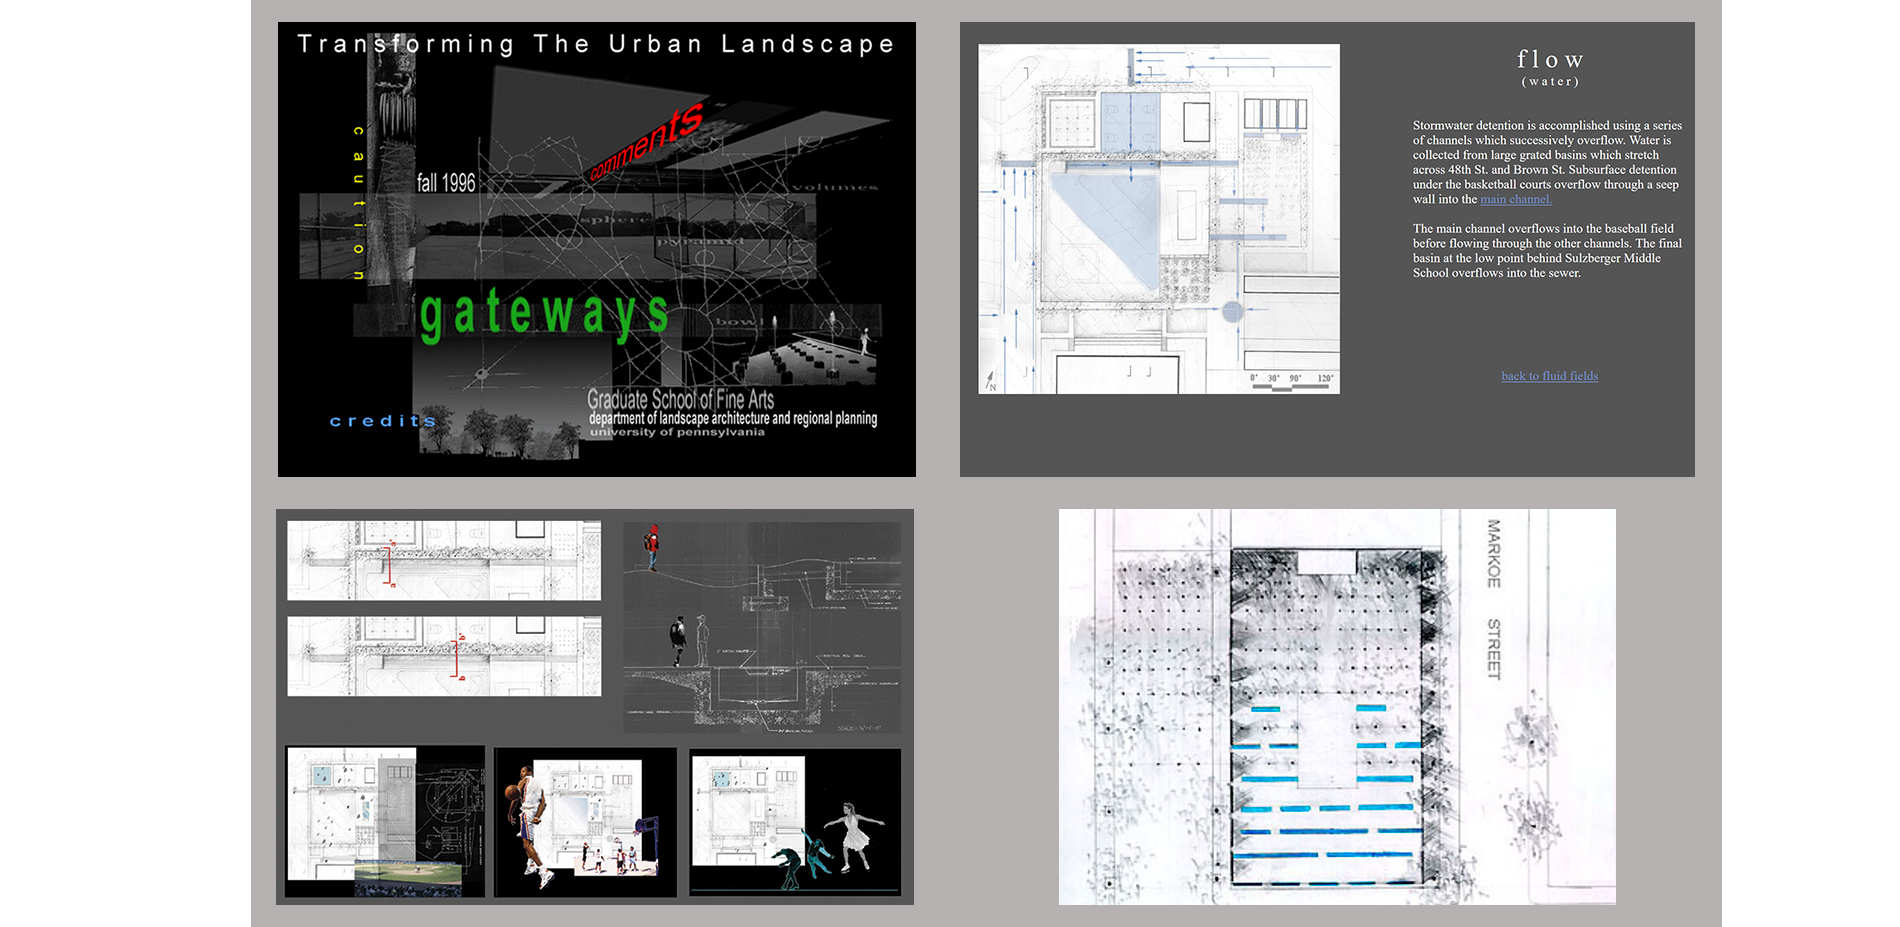 Transforming the Urban Landscape Studio (1996-1998)